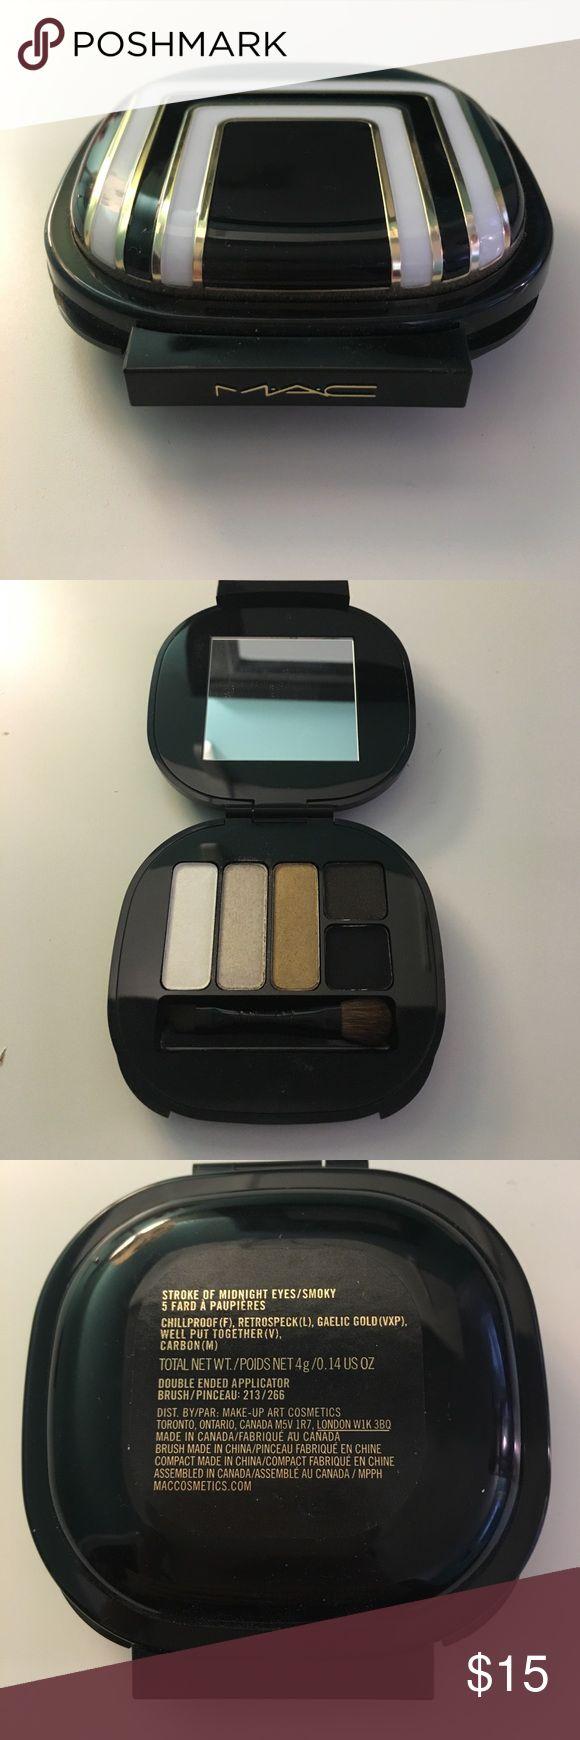 MAC eyeshadow palette Never used! Great condition! MAC Cosmetics Makeup Eyeshadow